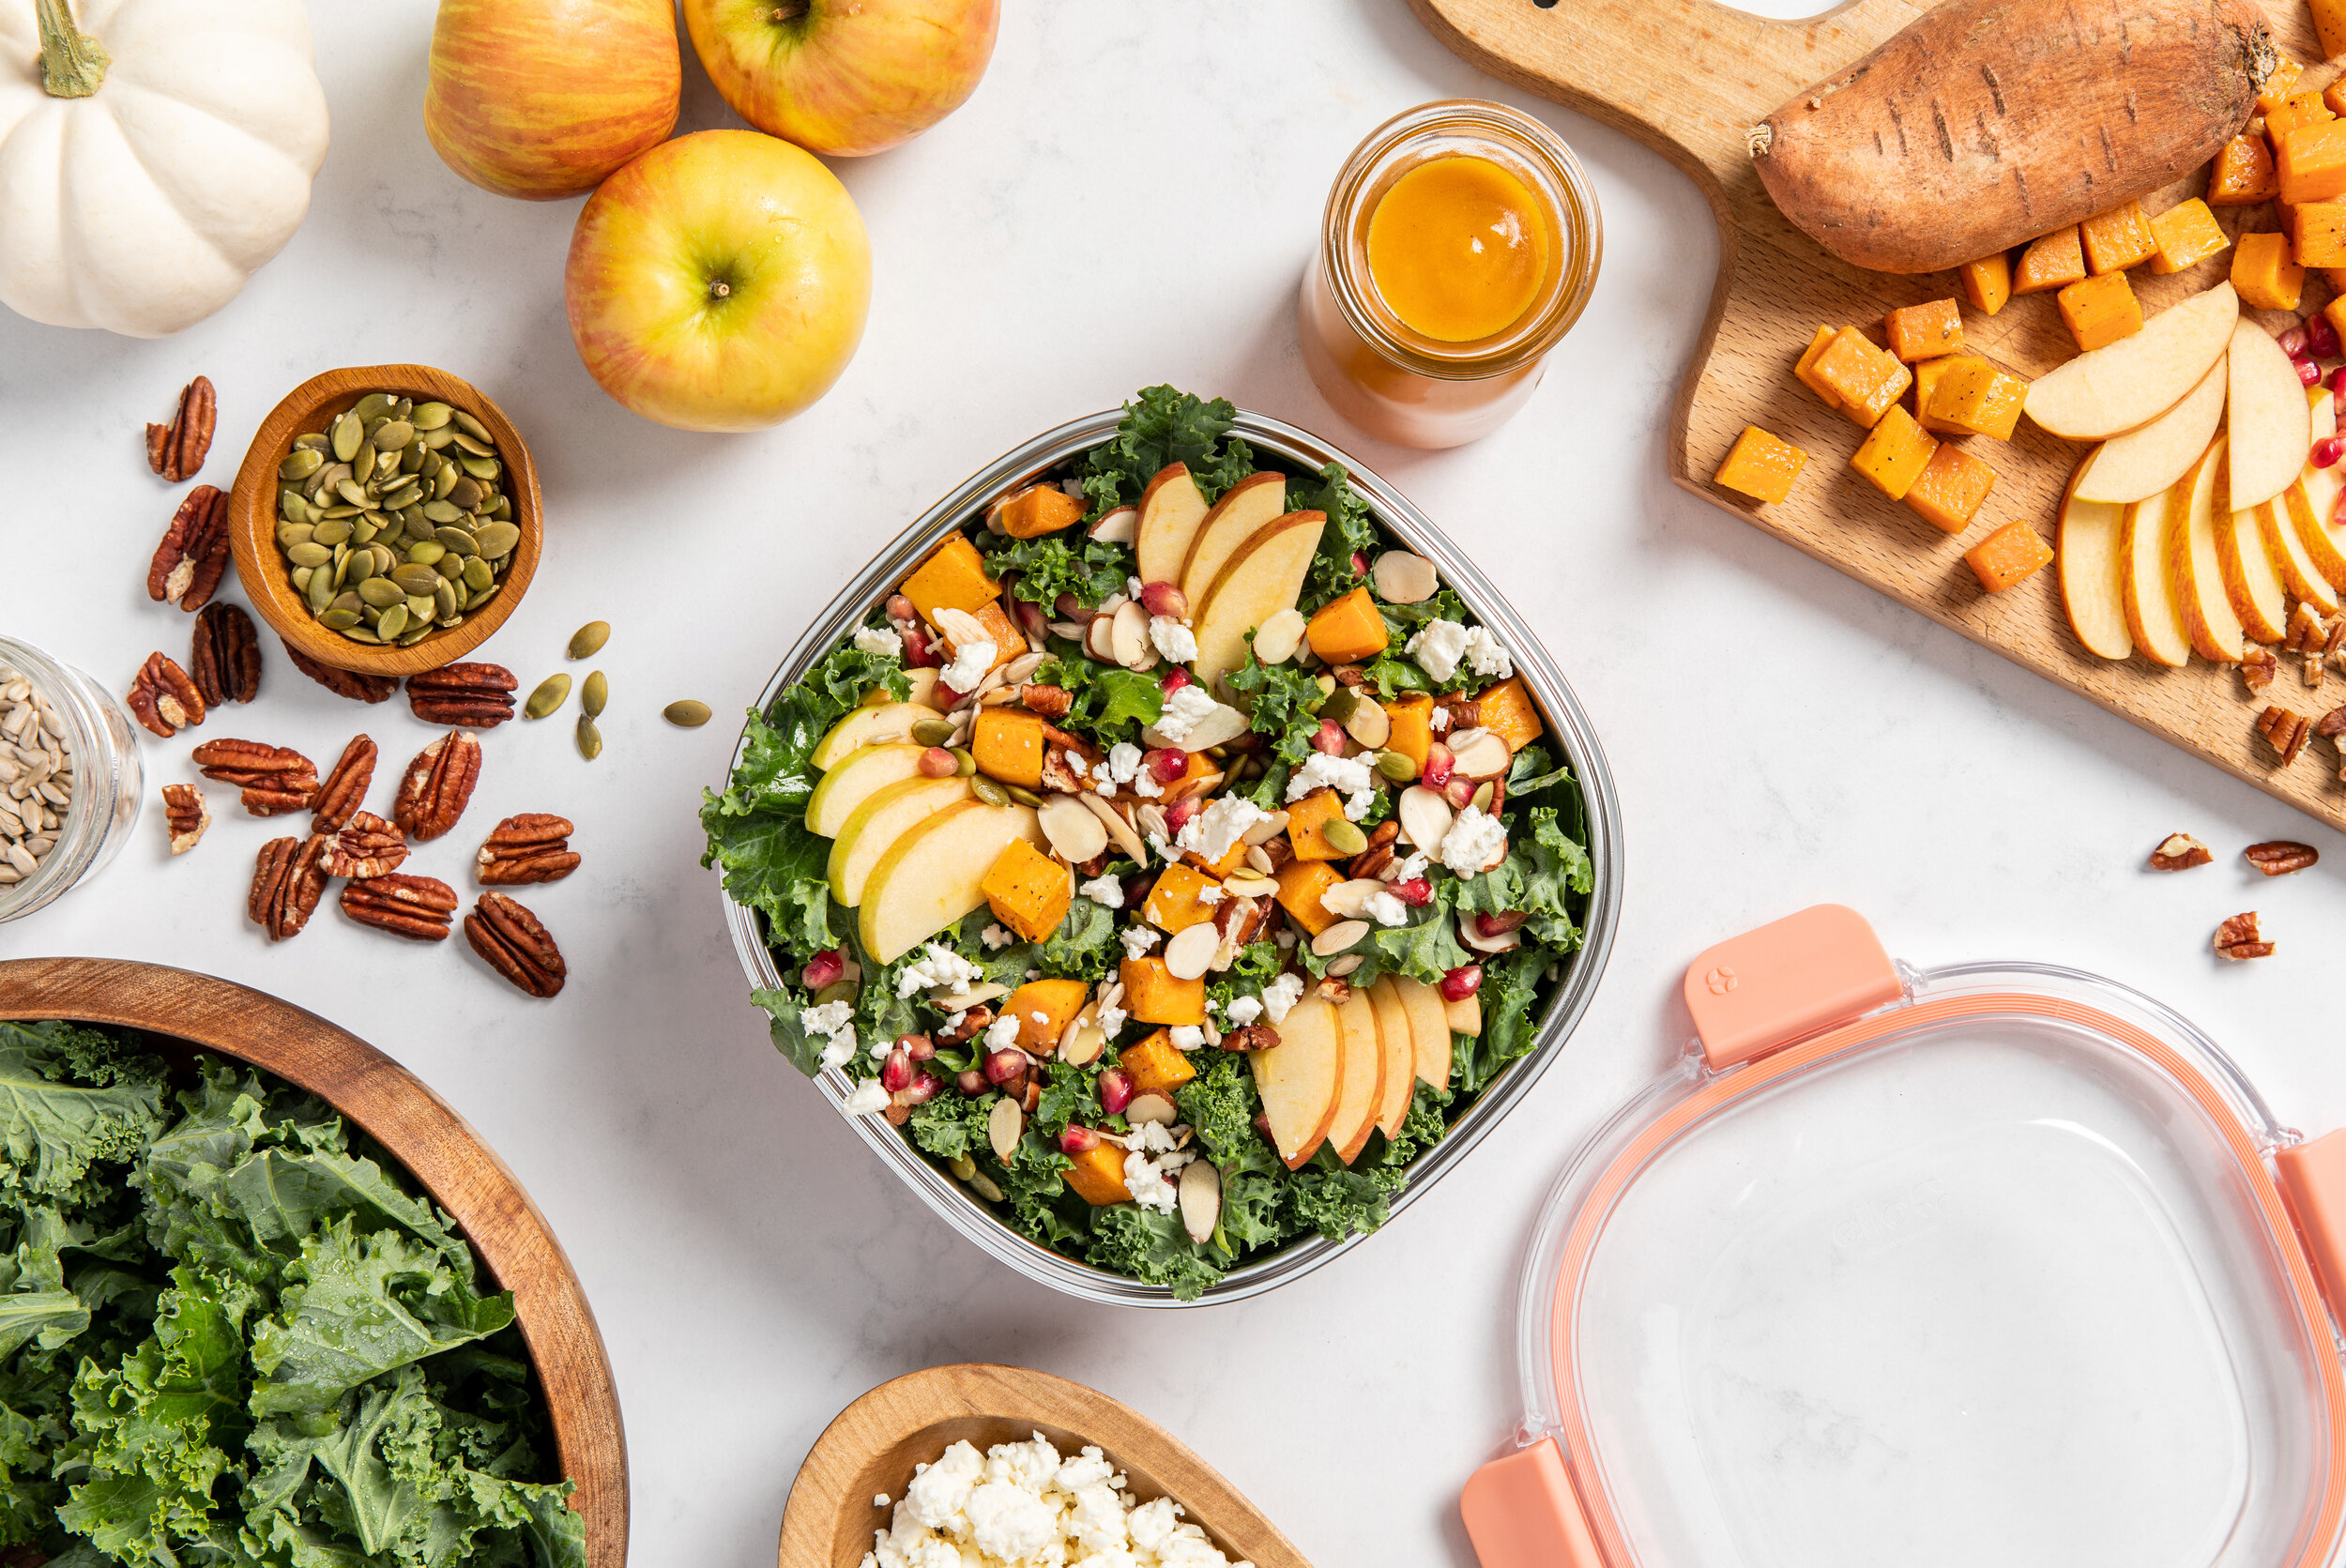 Ello_Stainless_Lunch_Bowl_Autumn_Harvest_Salad.jpg